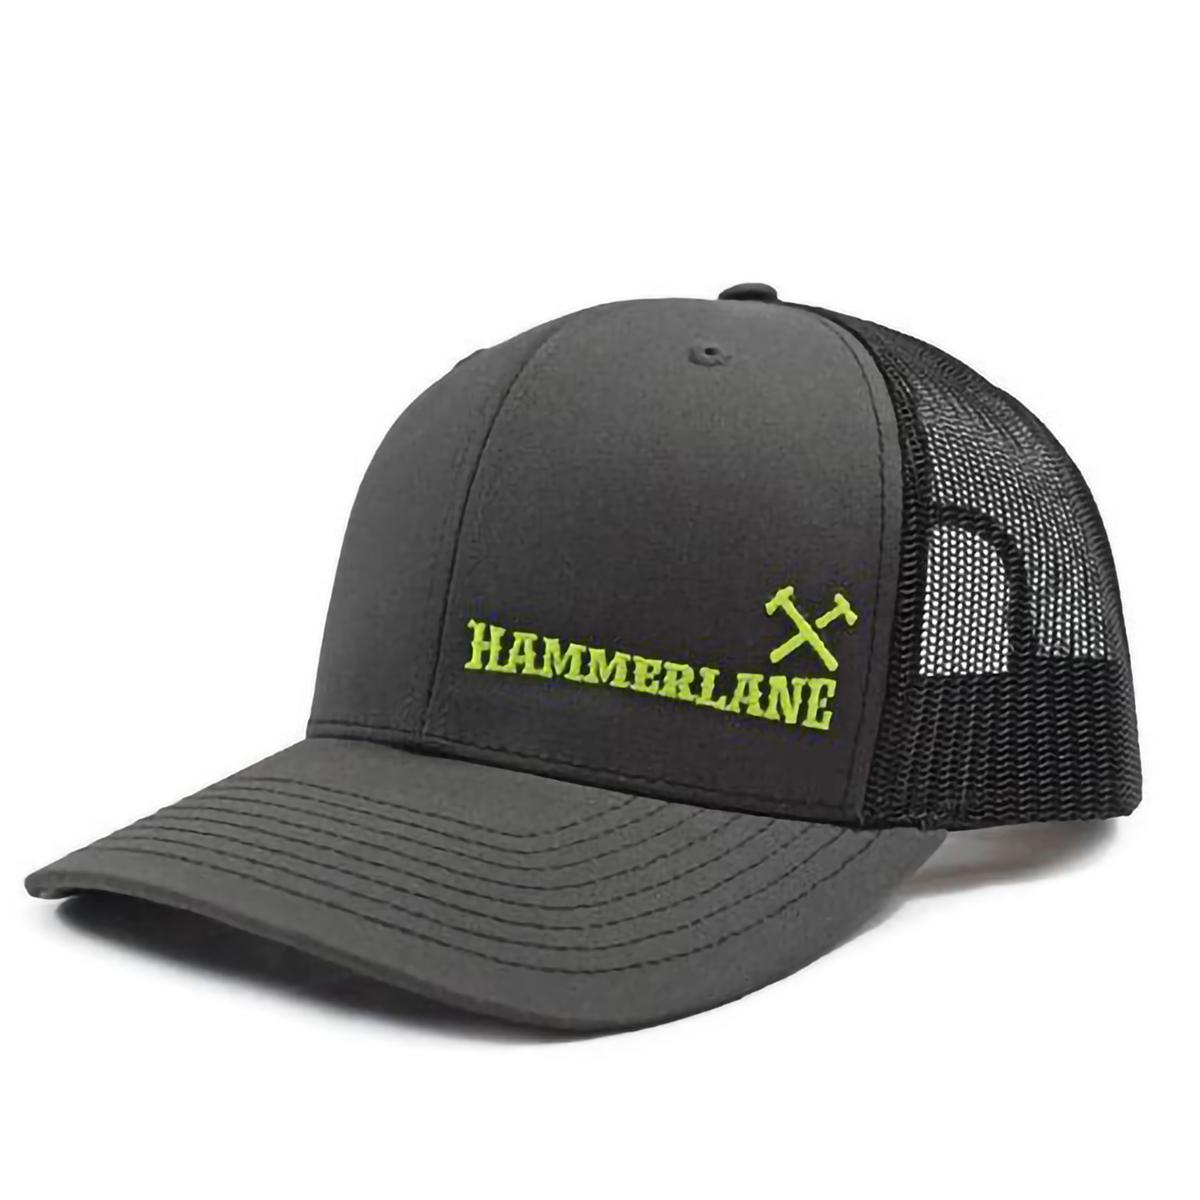 HAMMERLANE CROSS HAMMERS CAP CH/BLK NEON